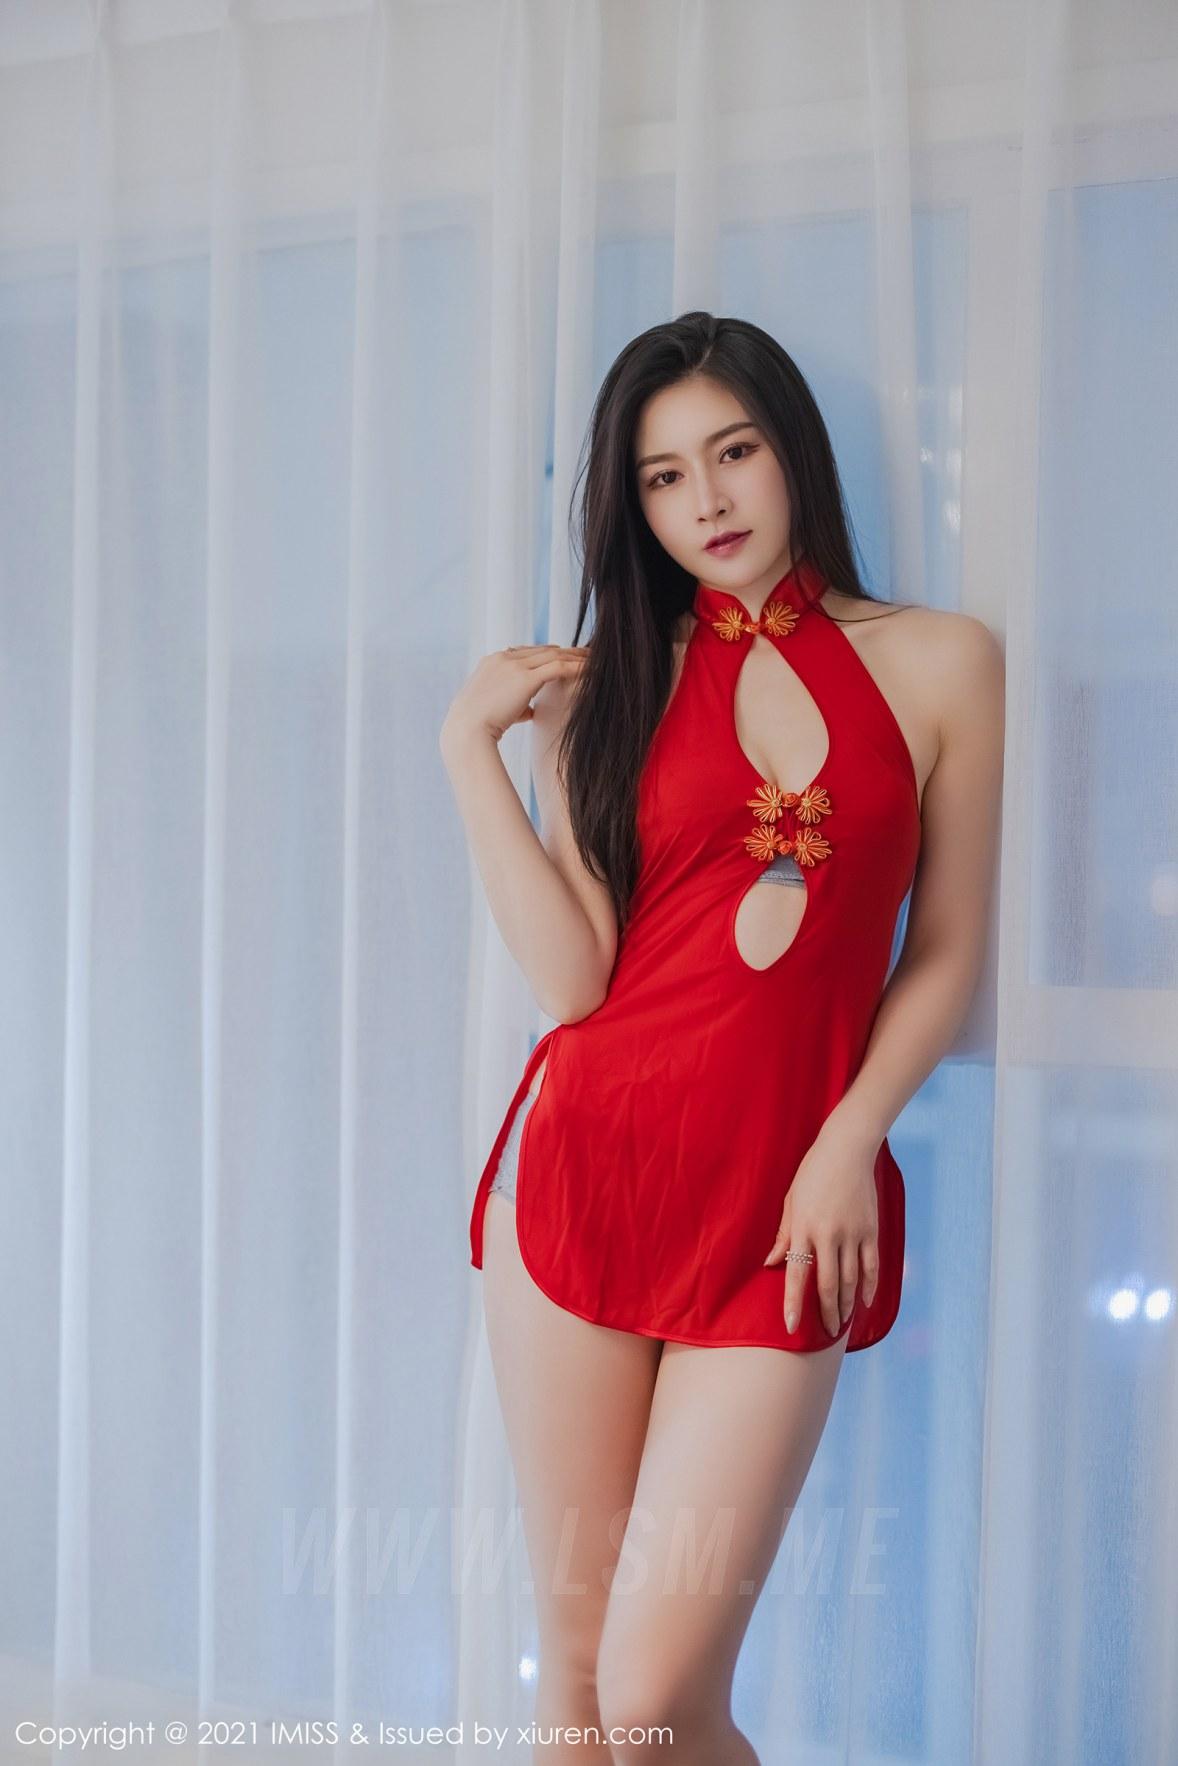 IMiss 爱蜜社 Vol.572 古典韵味 Vanessa 浪漫服装 - 4